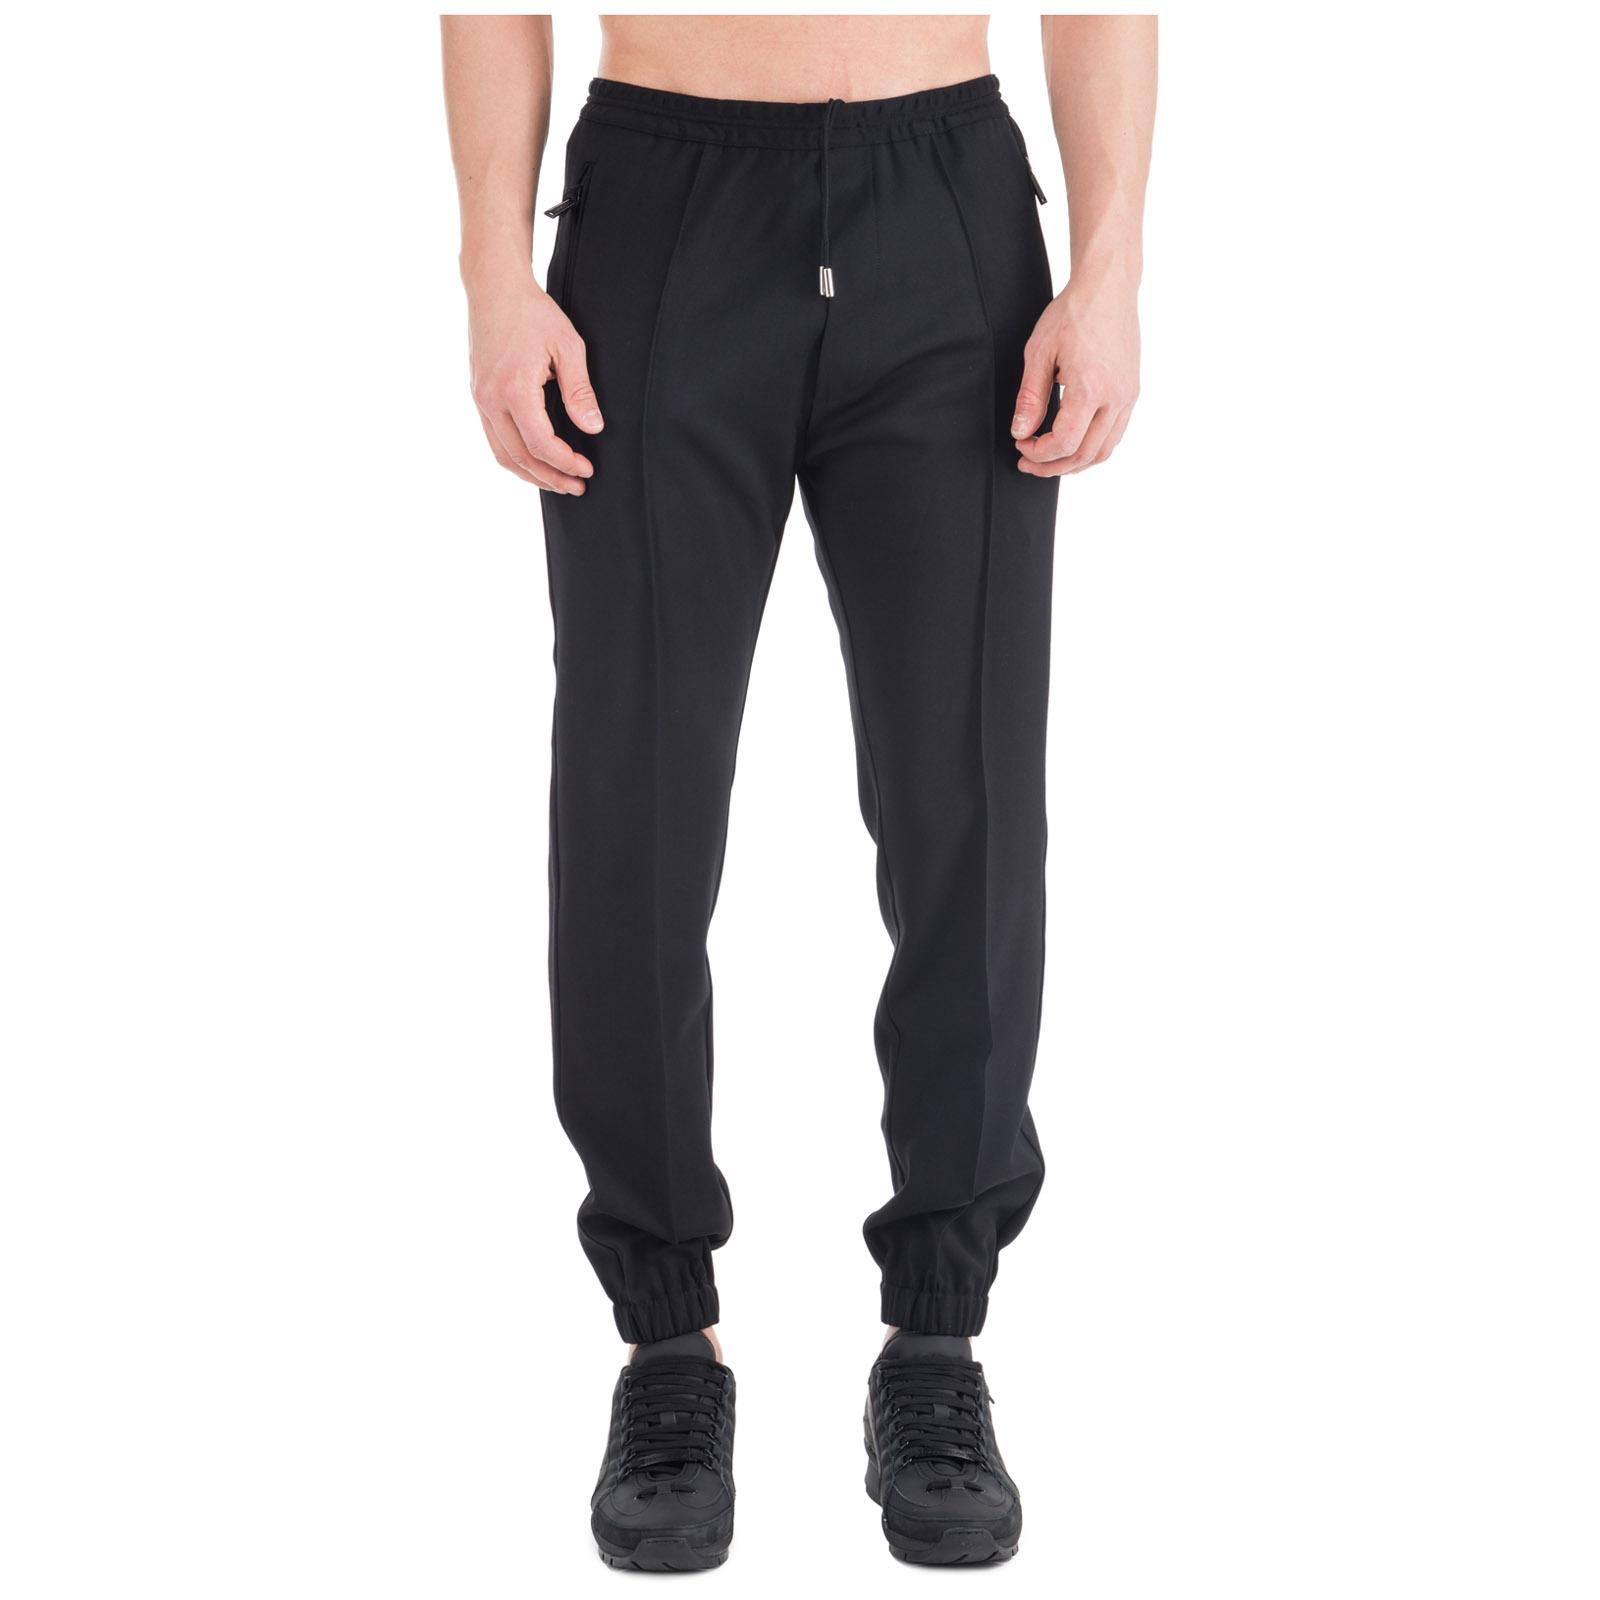 838dd7b144 Pantalons de sport Dsquared2 S74KB0153S36258900 nero | FRMODA.com